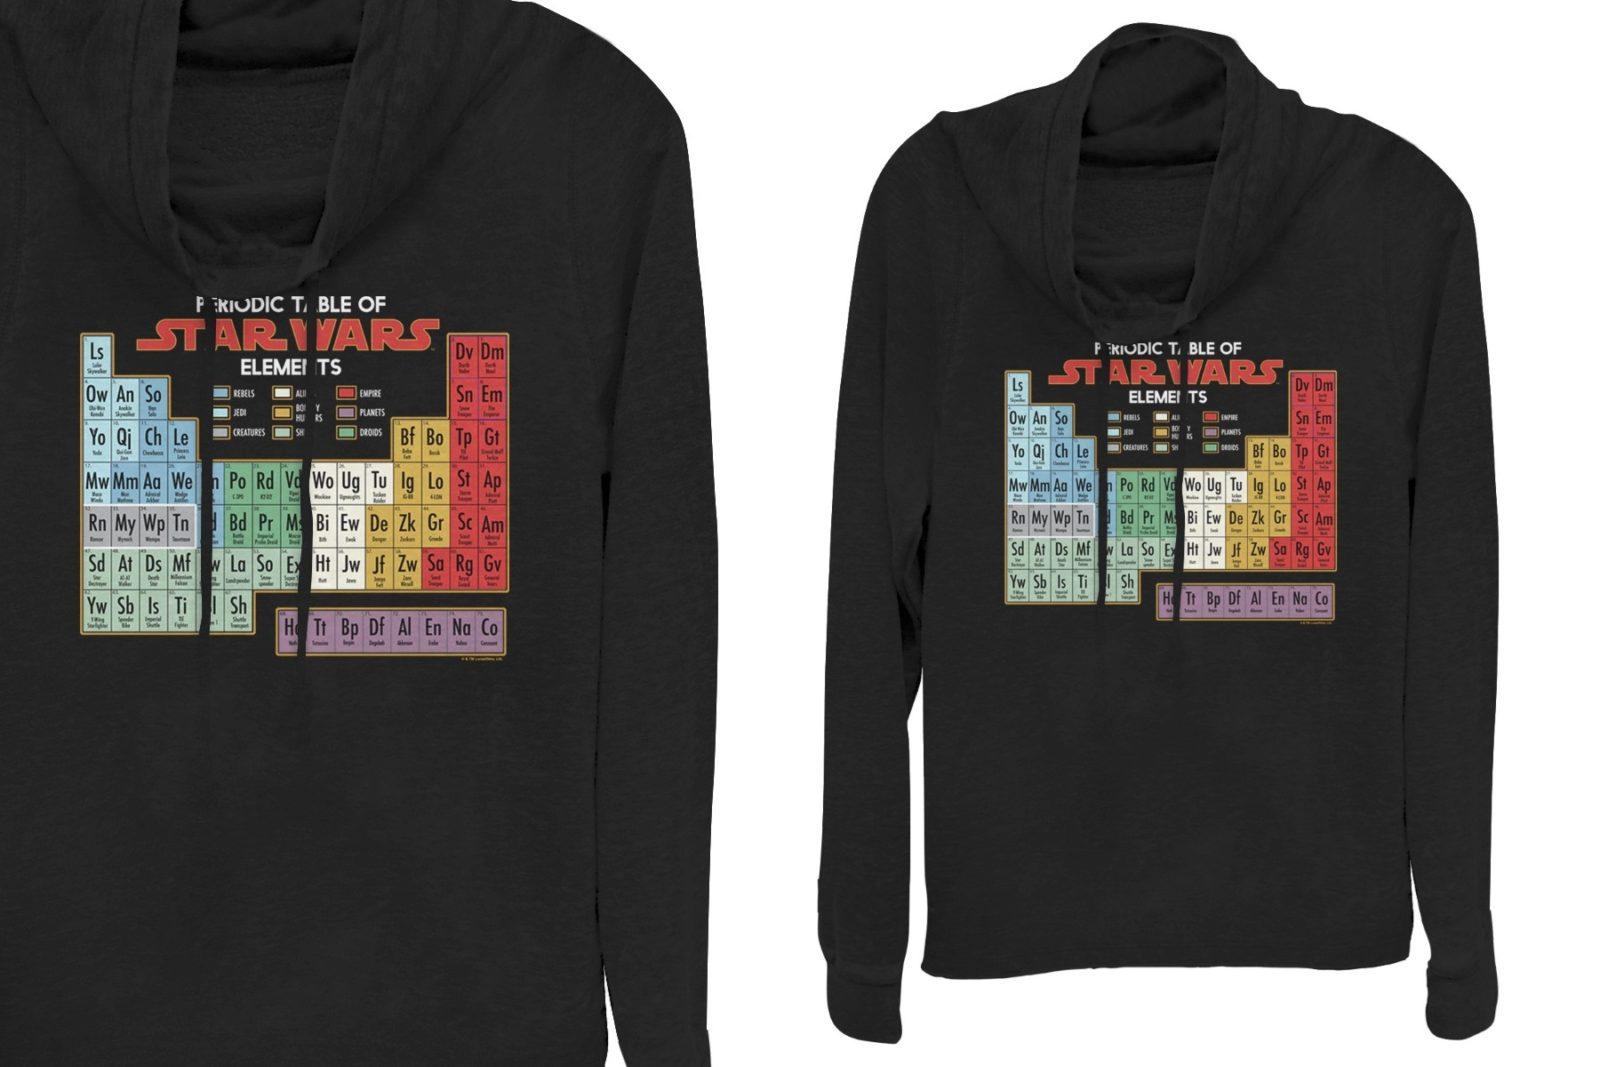 Star Wars Periodic Table of Elements Sweatshirt